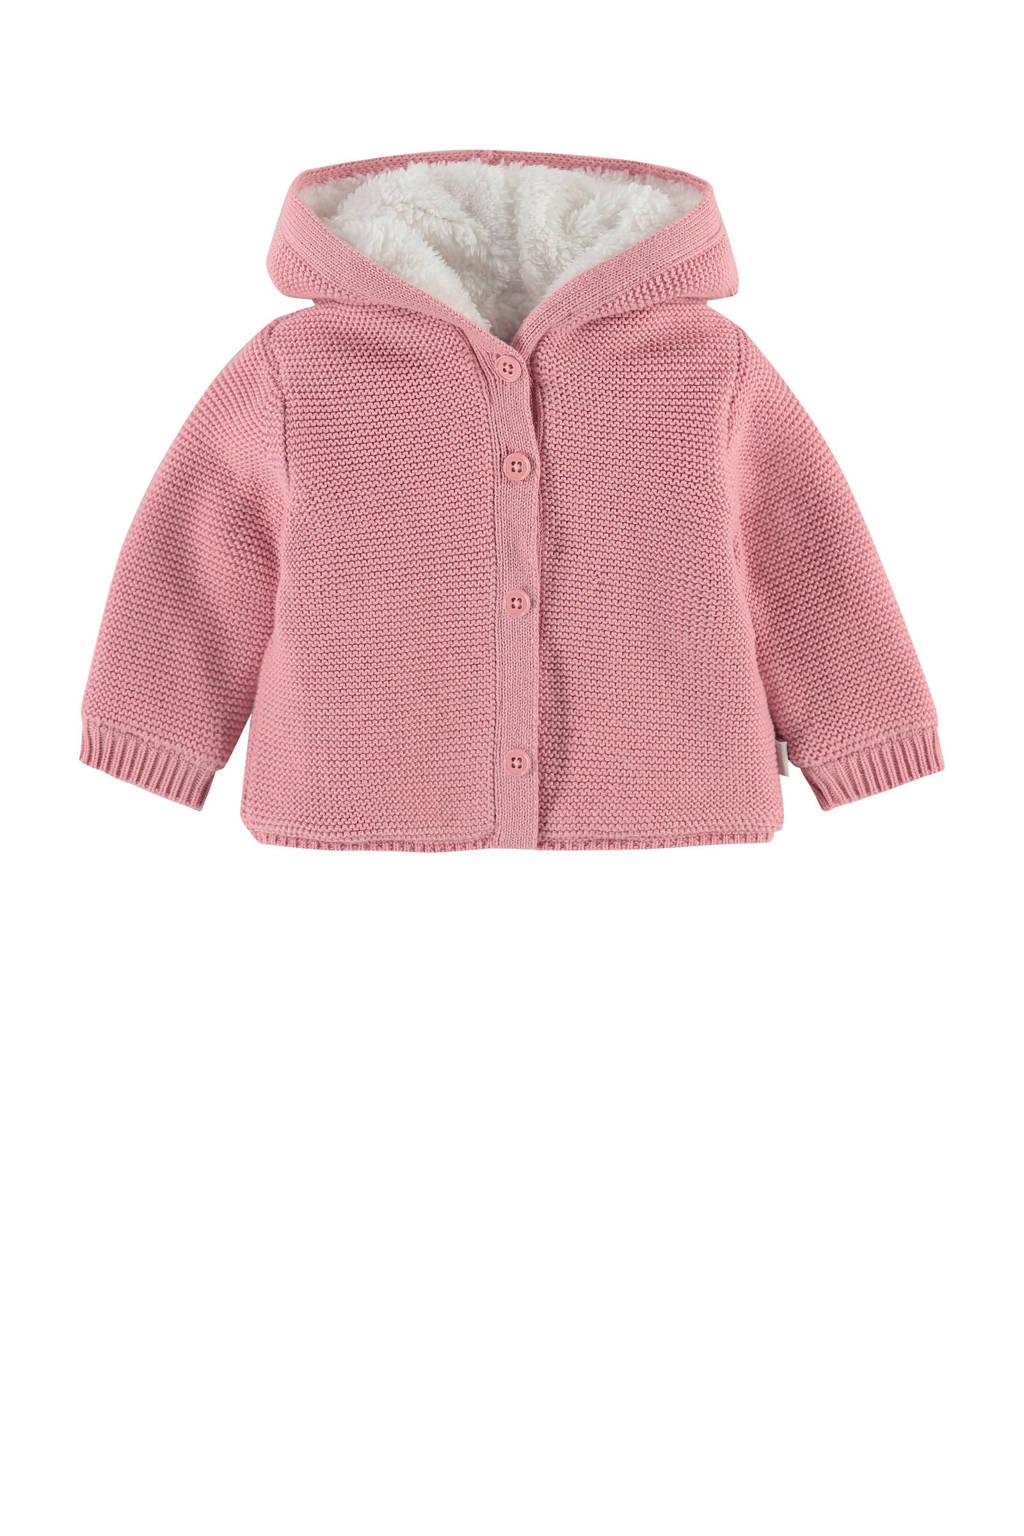 Noppies baby borgvest Cookeville roze, Roze